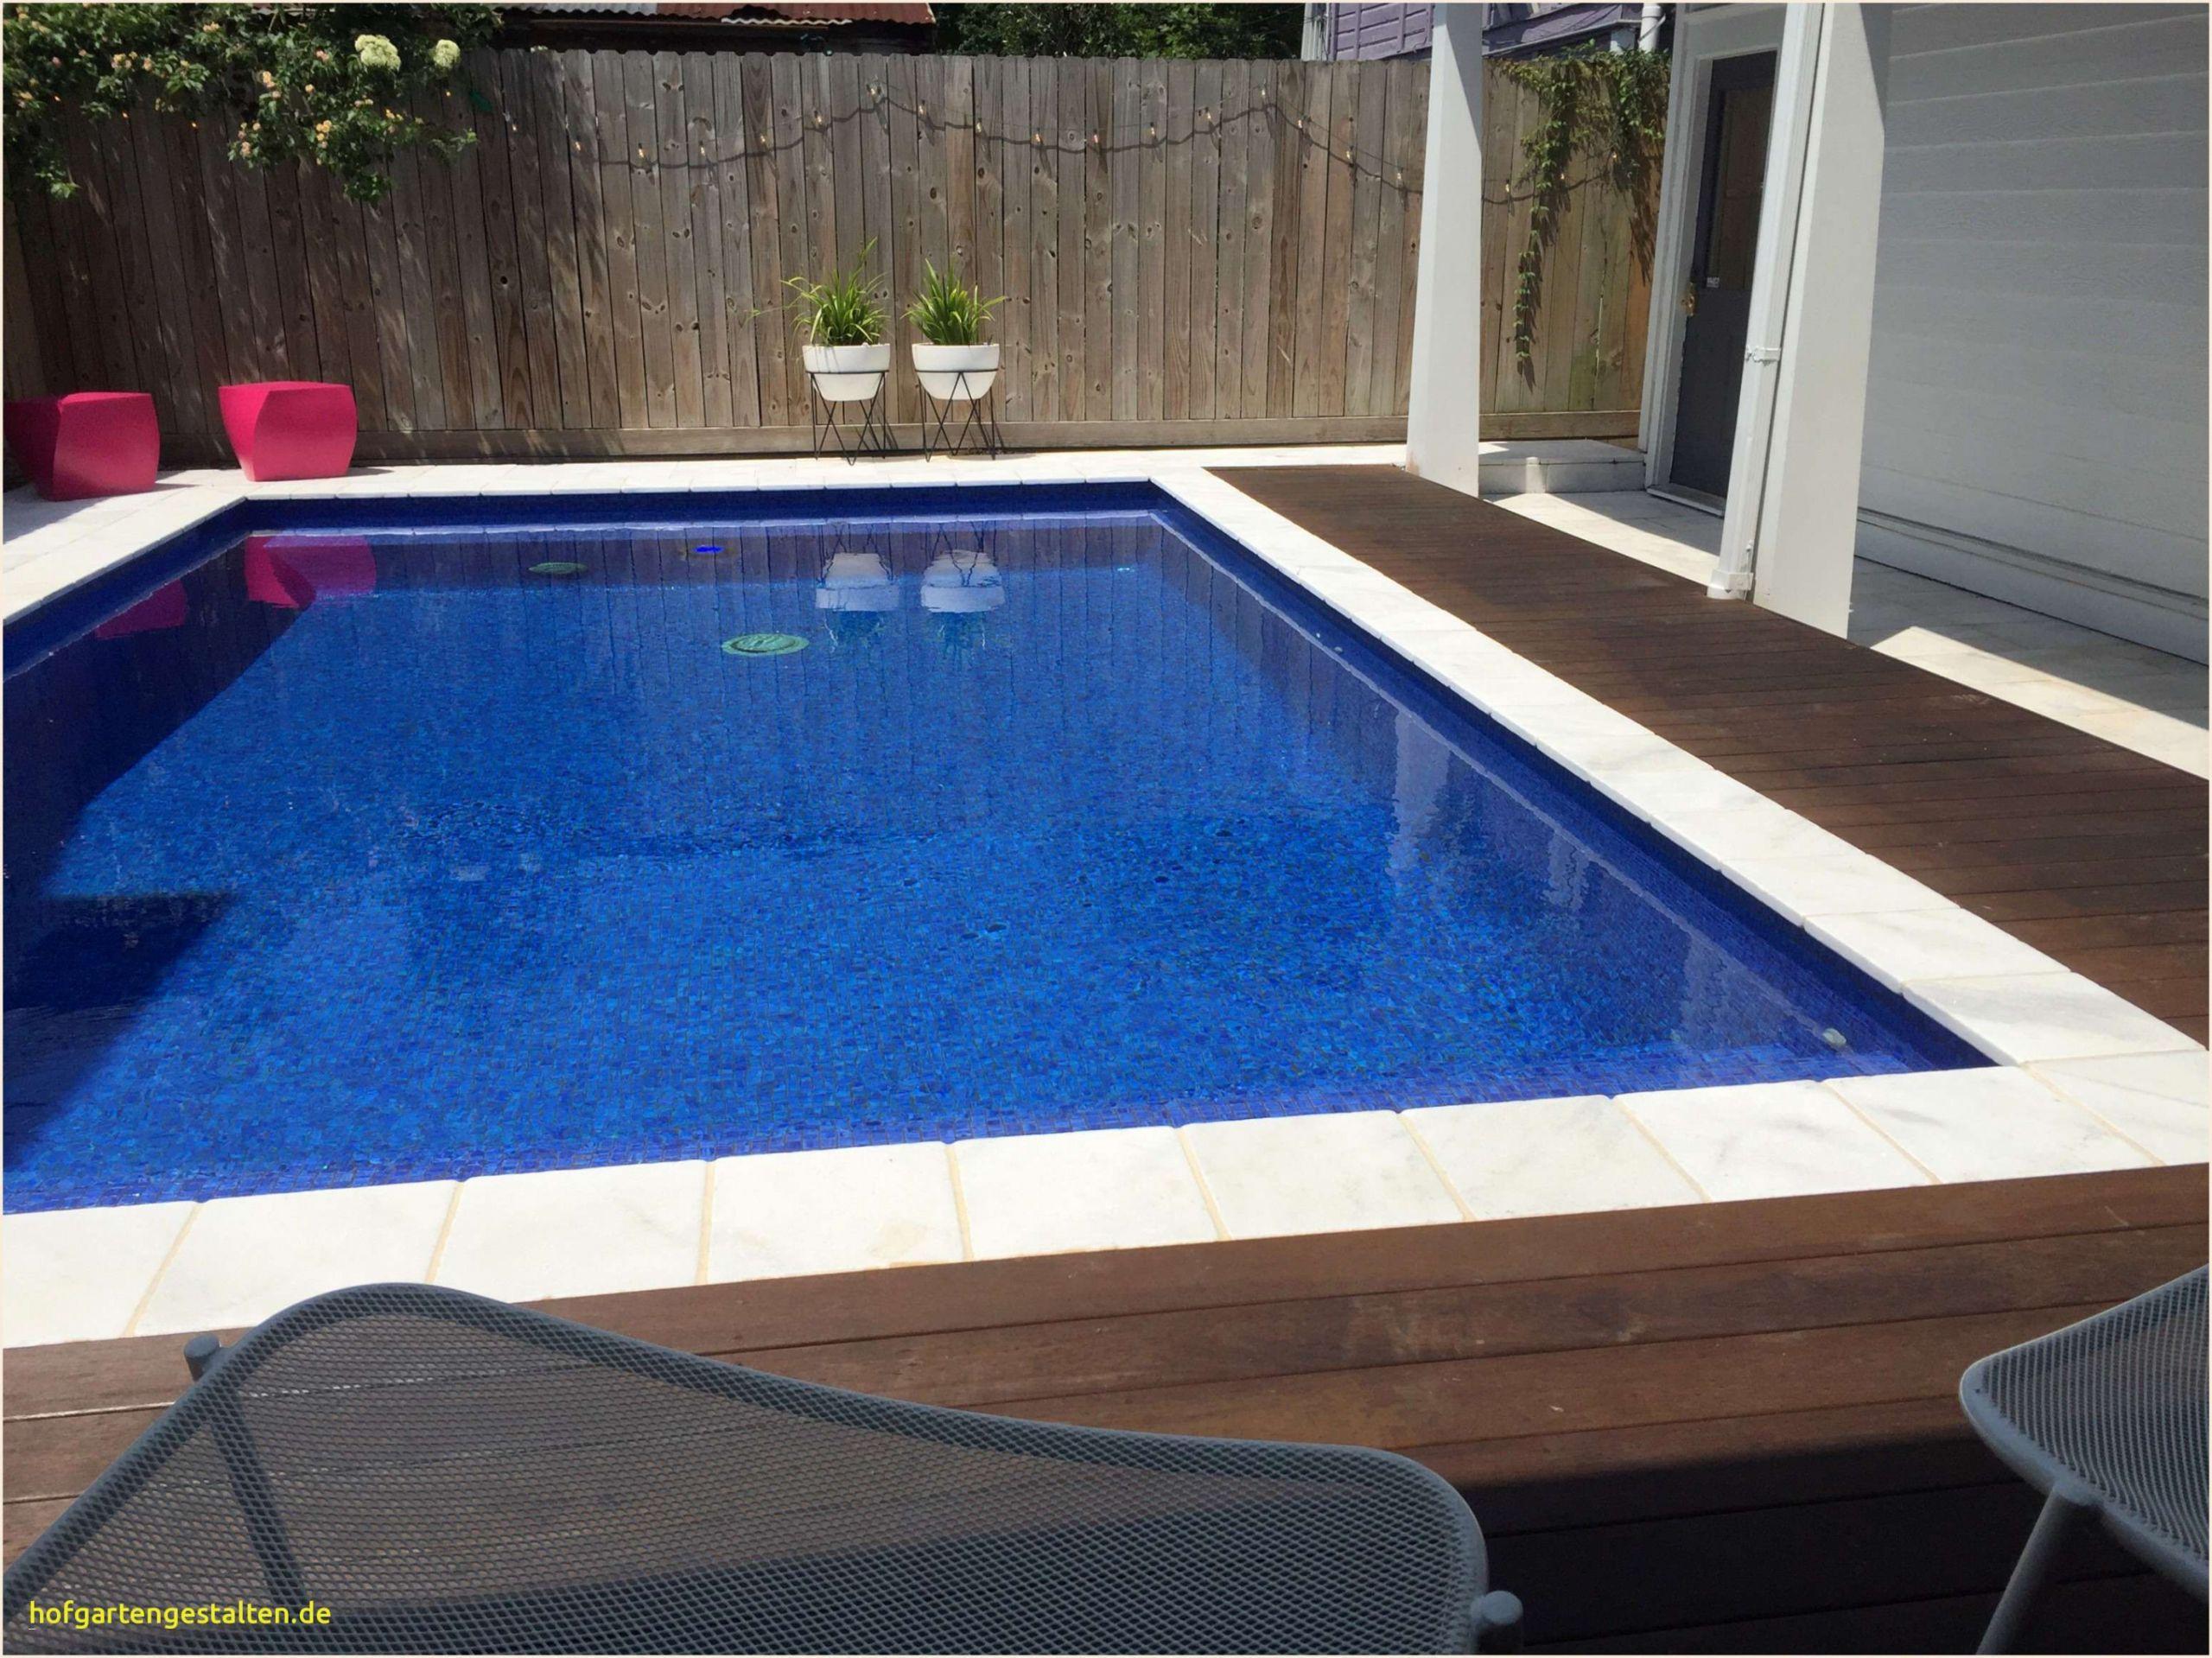 42 schon pool bestellen grafik pool bilder inspiration pool bilder inspiration